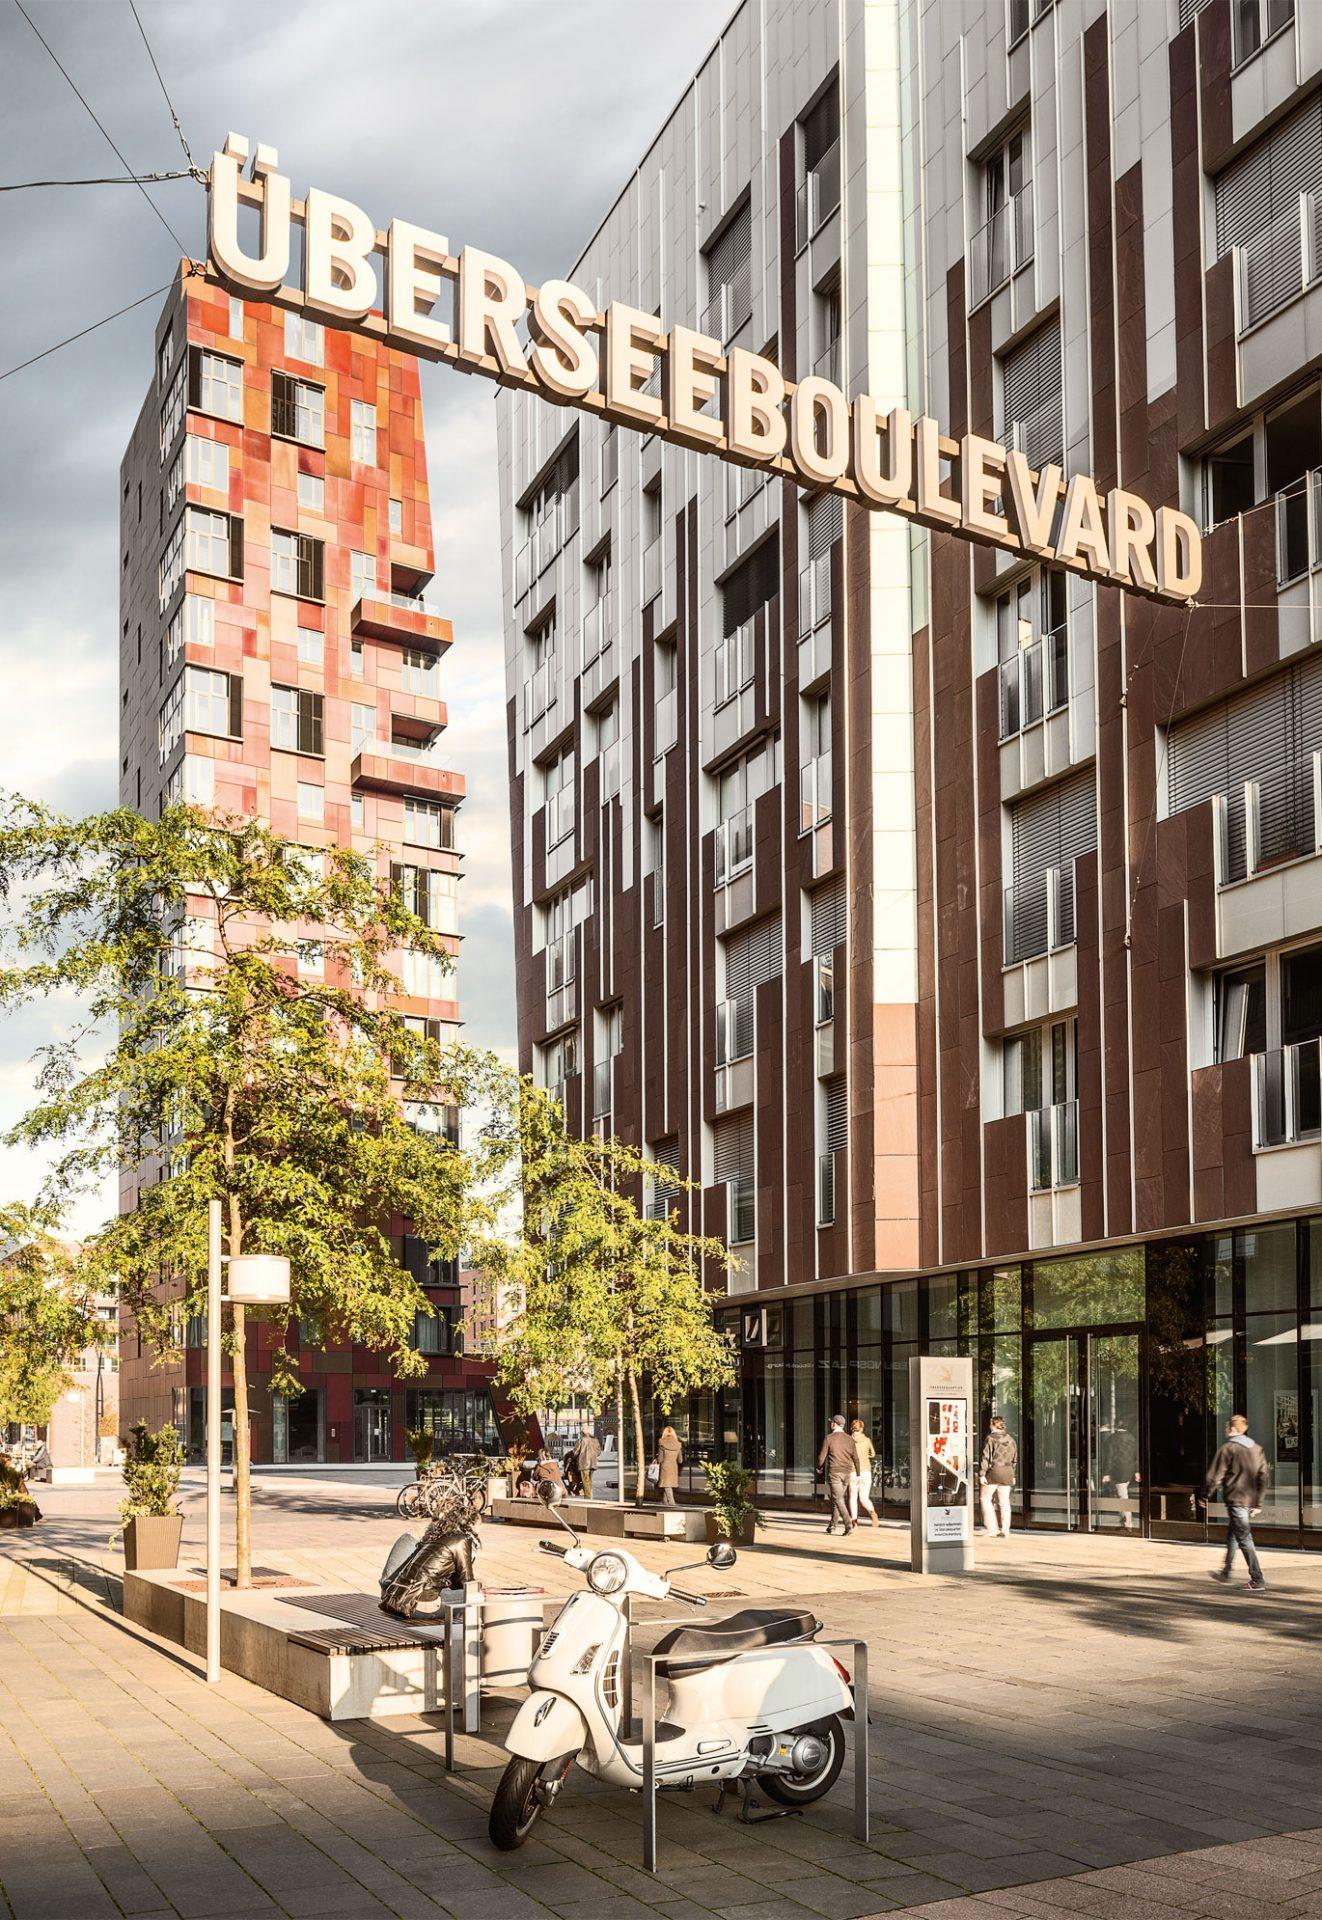 uberssee_boulevard